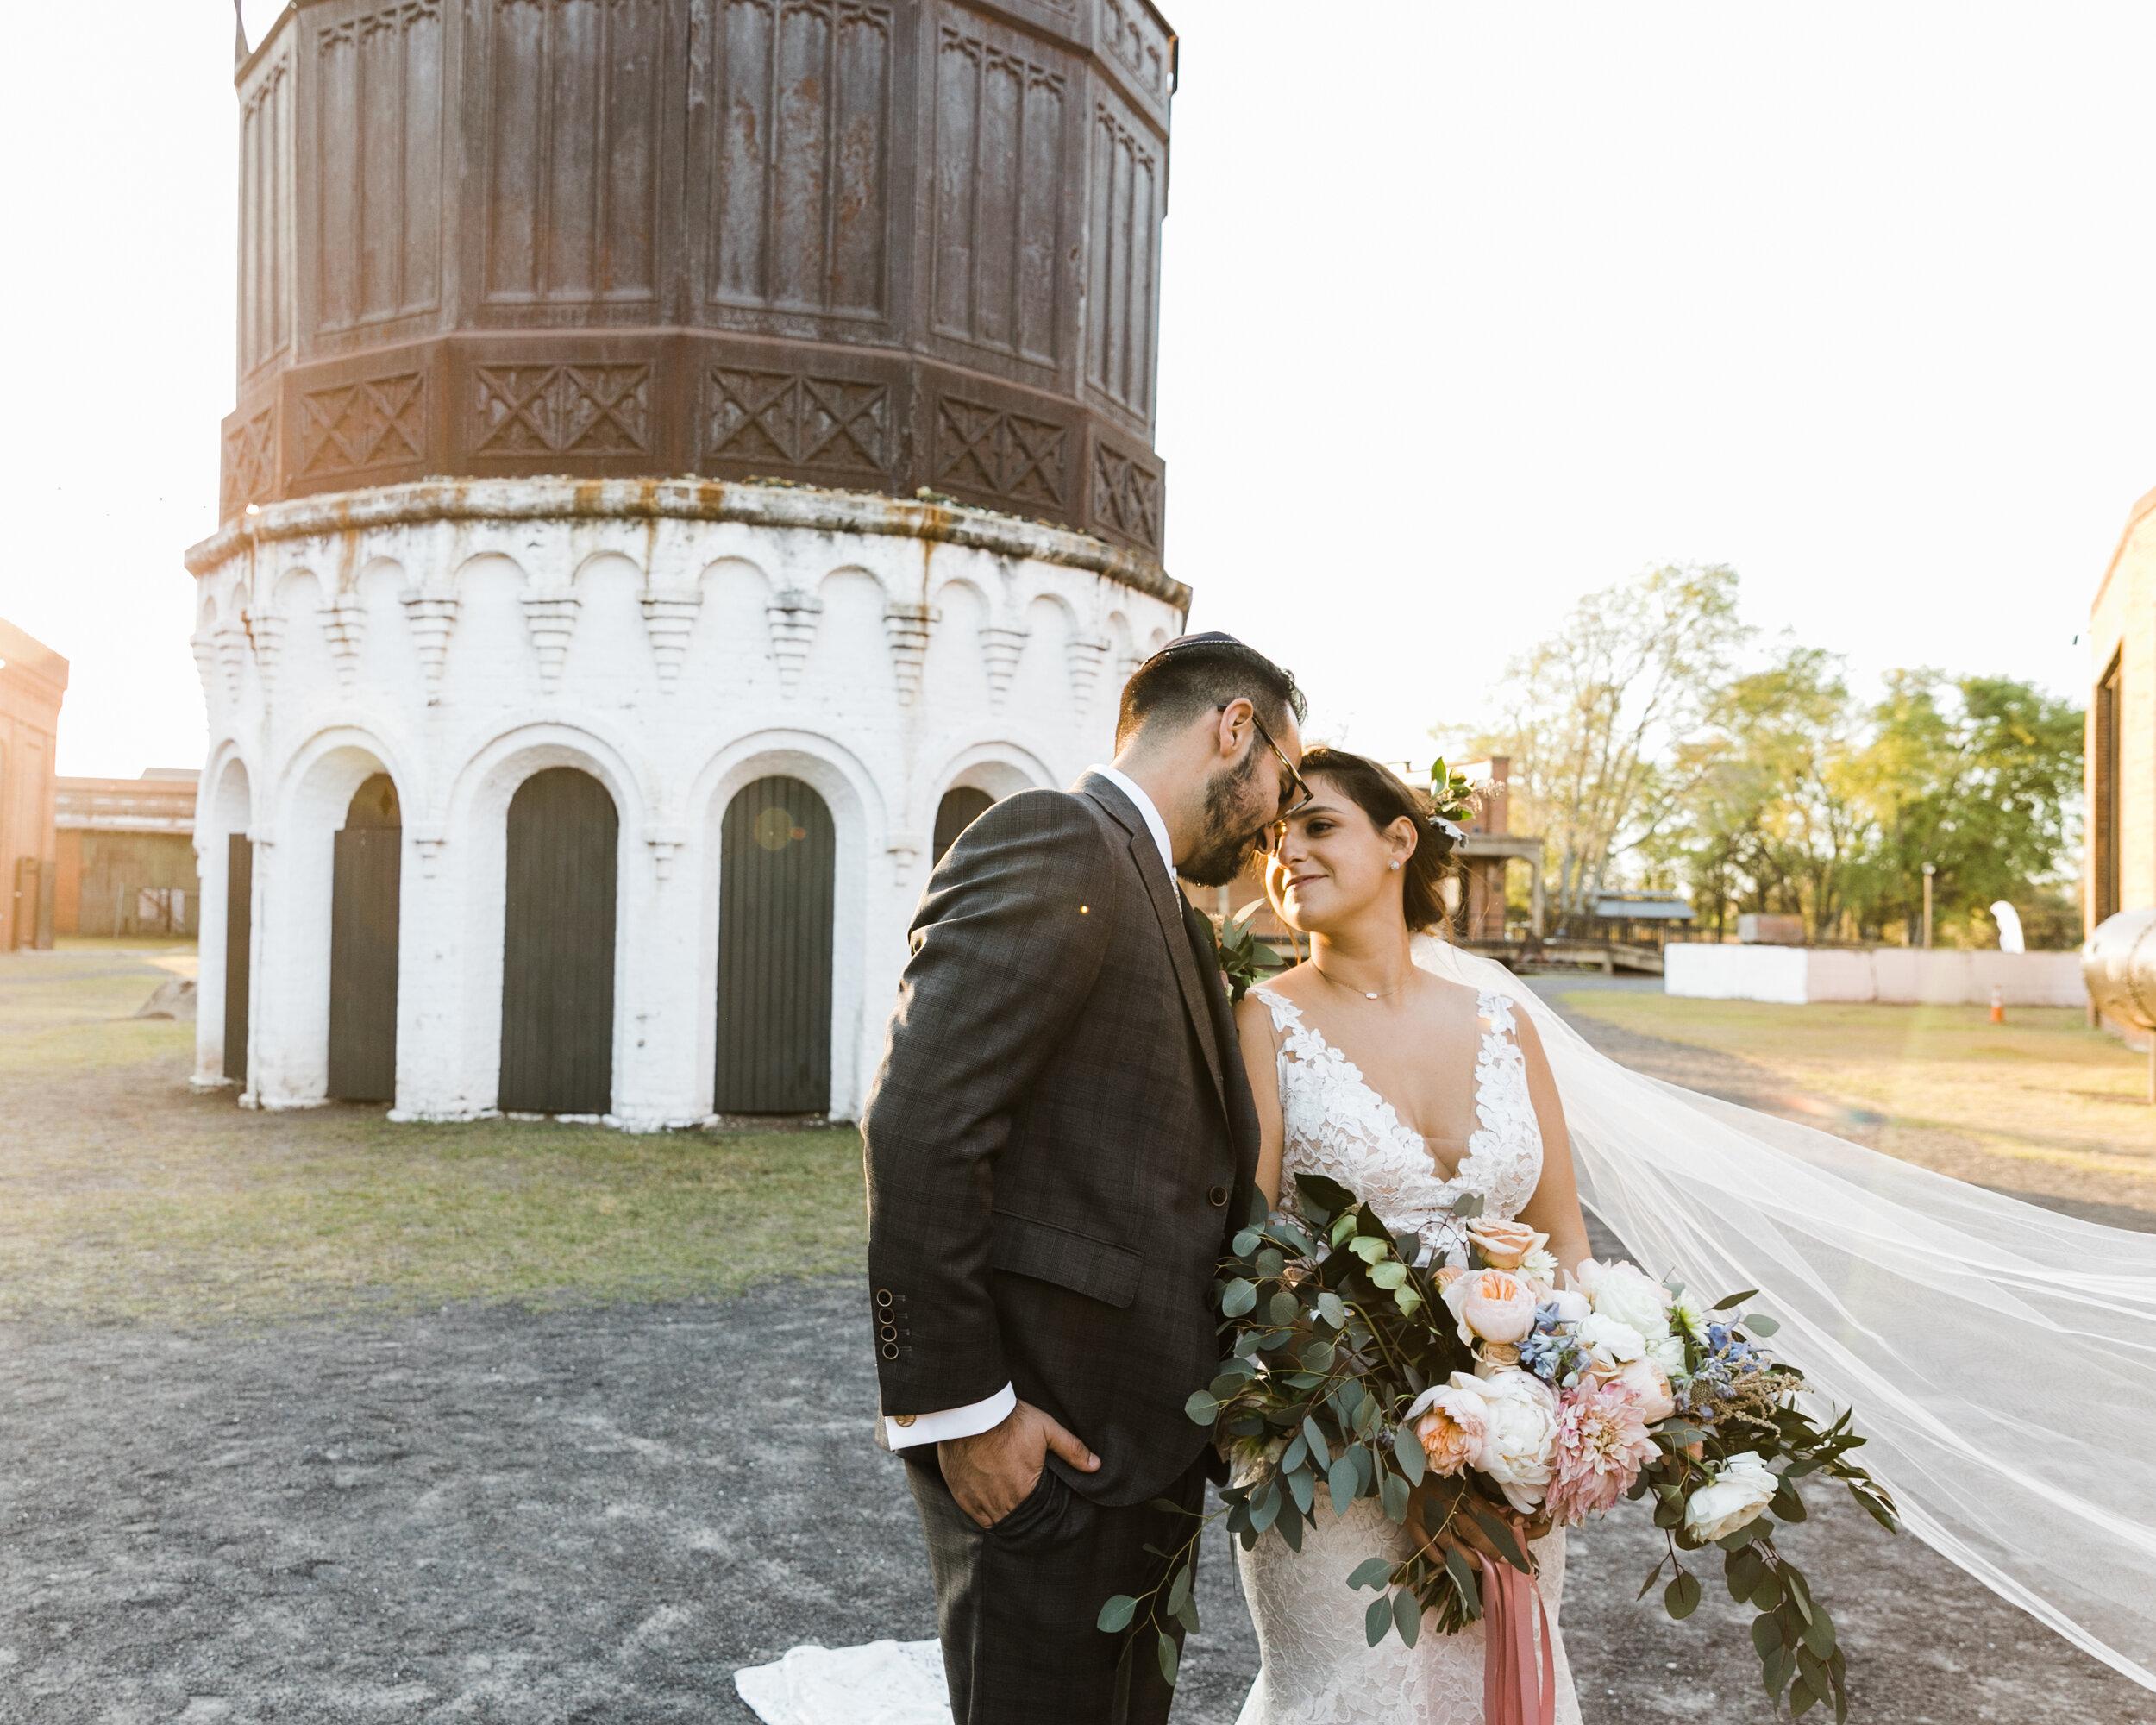 ivory-and-beau-blog-weddings-ivory-and-beau-couple-dominique-and-andres-savannah-florist-wedding-planning-savannah-bridal-boutique-wedding-flowers-KIP_WEBERWEDDING_RAILROADMUSEUM-1276.JPG